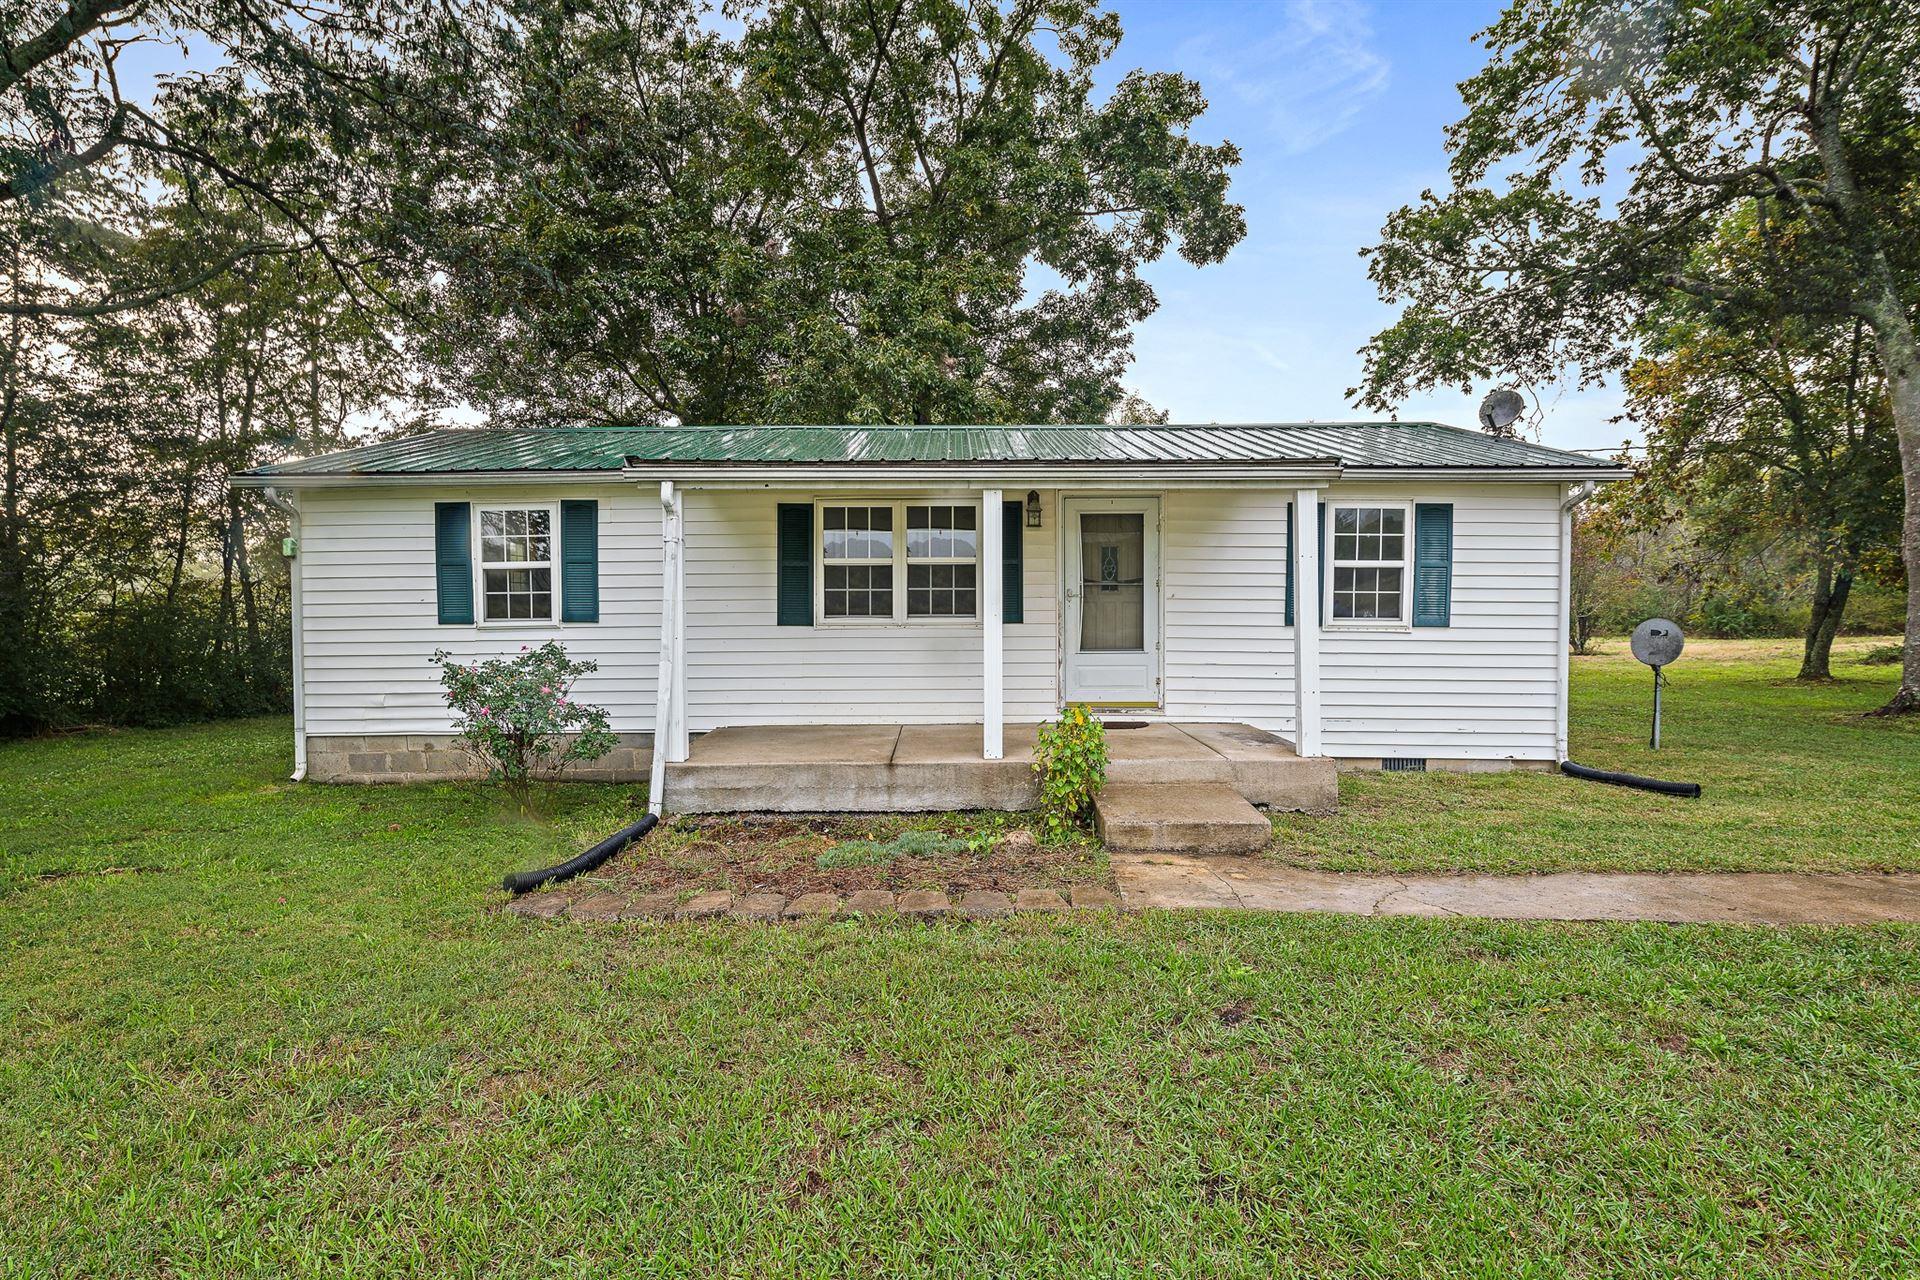 431 Mount Vernon Rd, Eagleville, TN 37060 - MLS#: 2297827